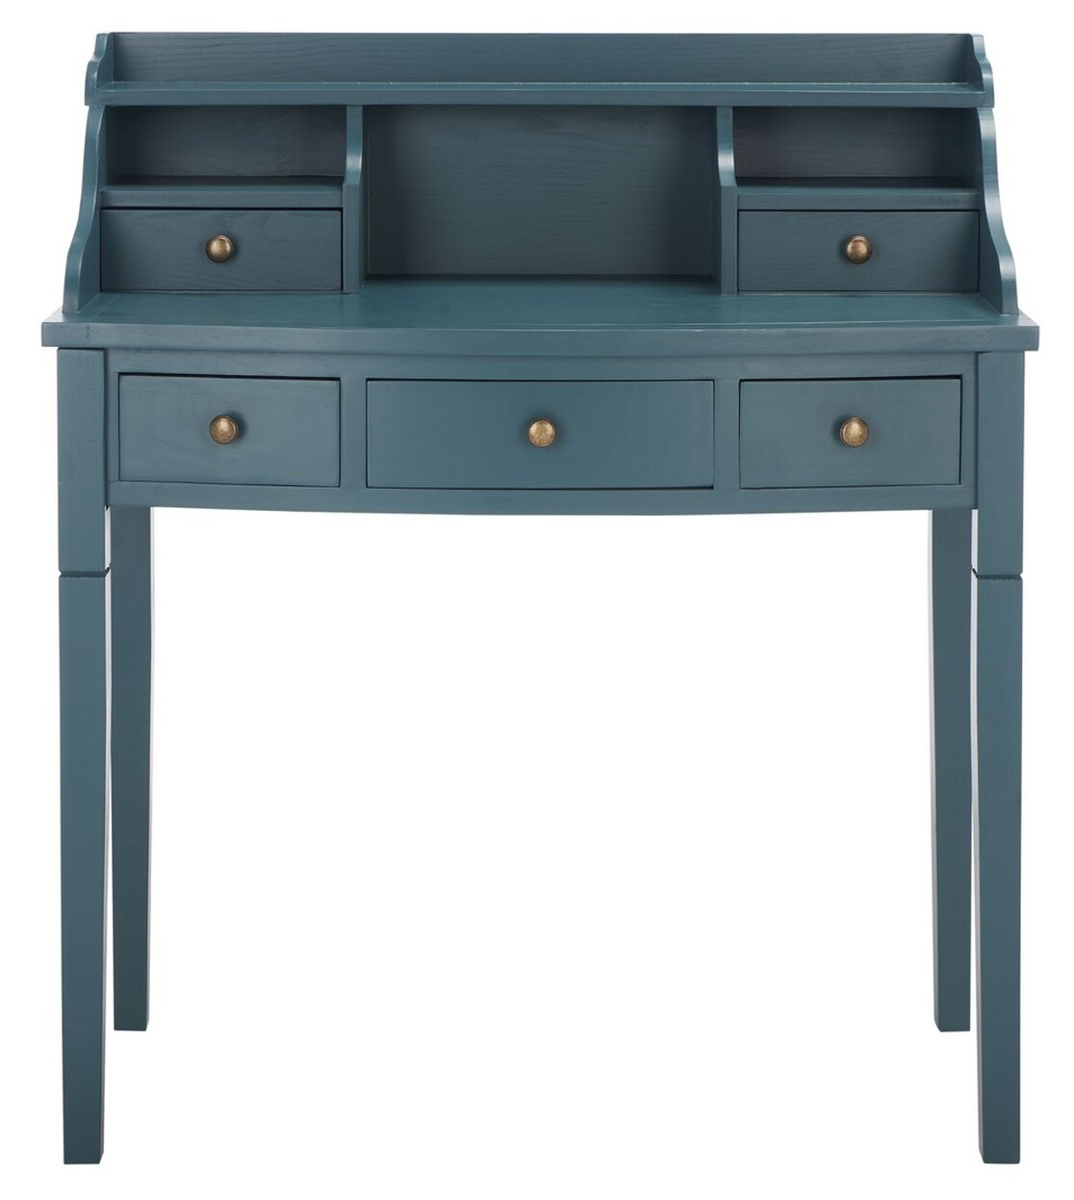 Desks Color Slate Teal Save Amh6516e